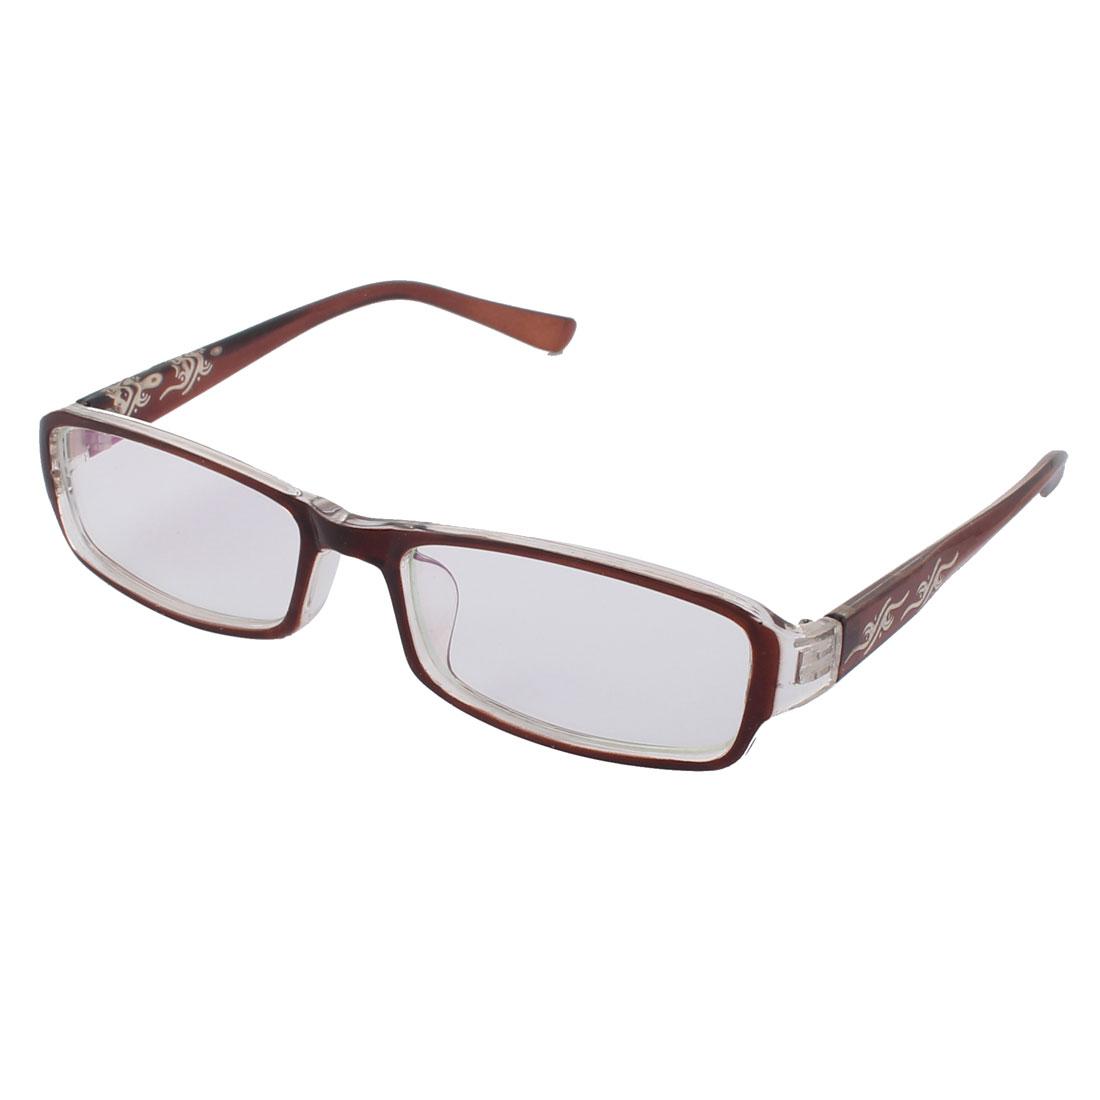 Students Transparent Lens Brown Flower Decor Frame Plastic Eyewear Plain Glass